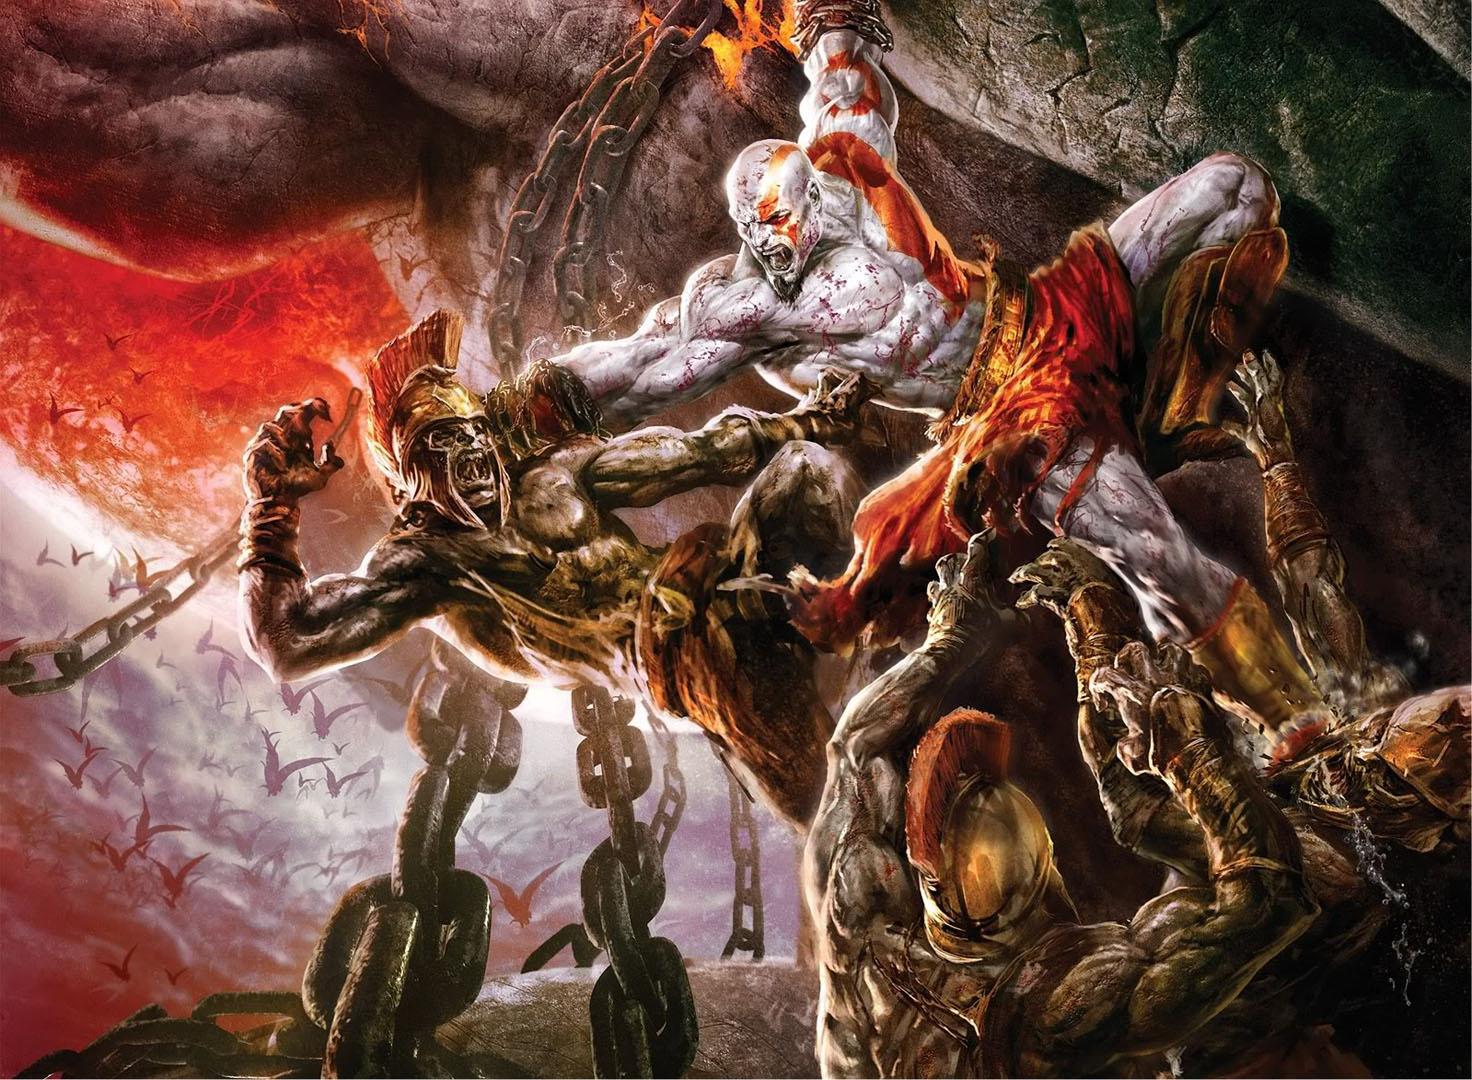 Kratos Fighting Undead Greek Soldiers